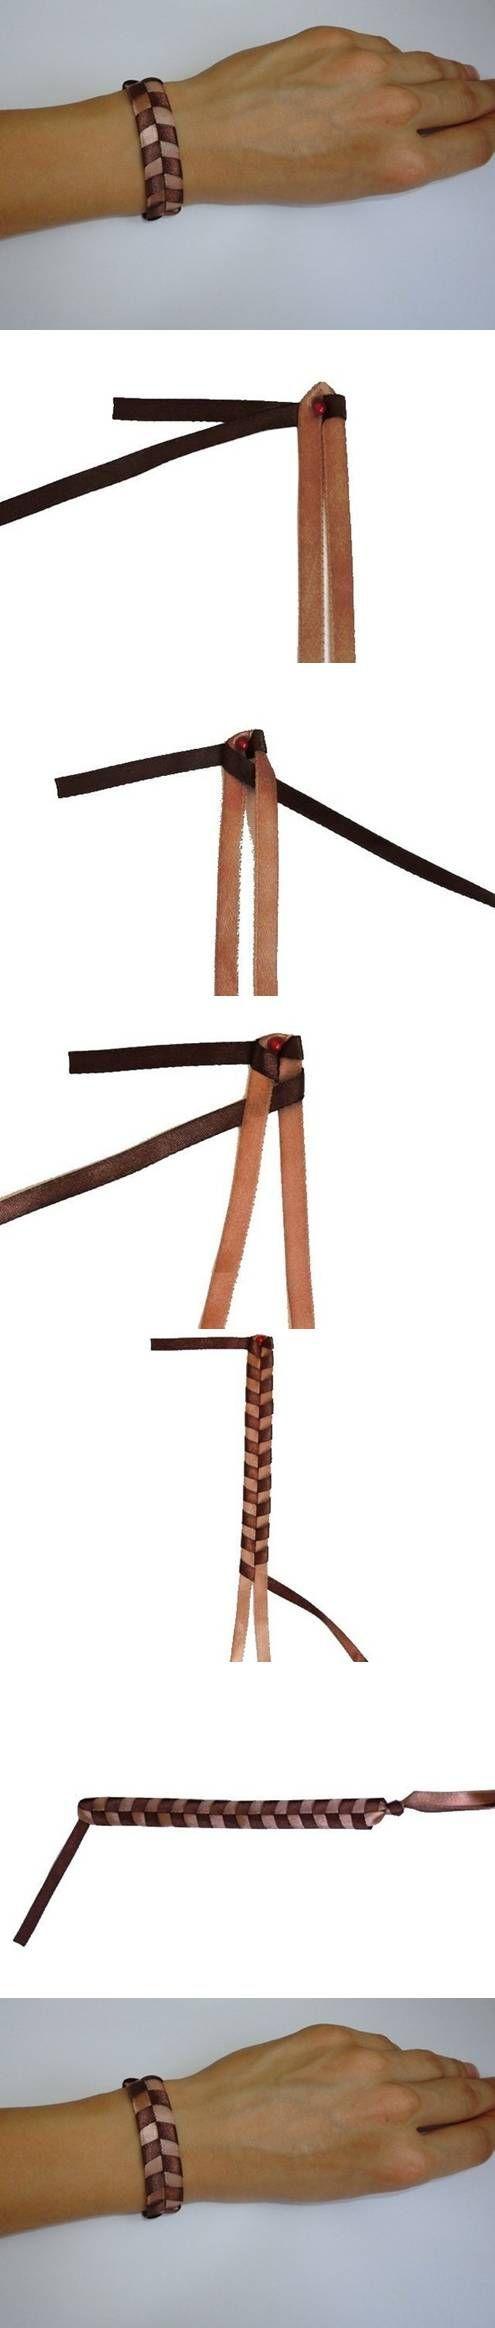 DIY Quick Simple Leather Bracelet DIY Projects / UsefulDIY.com